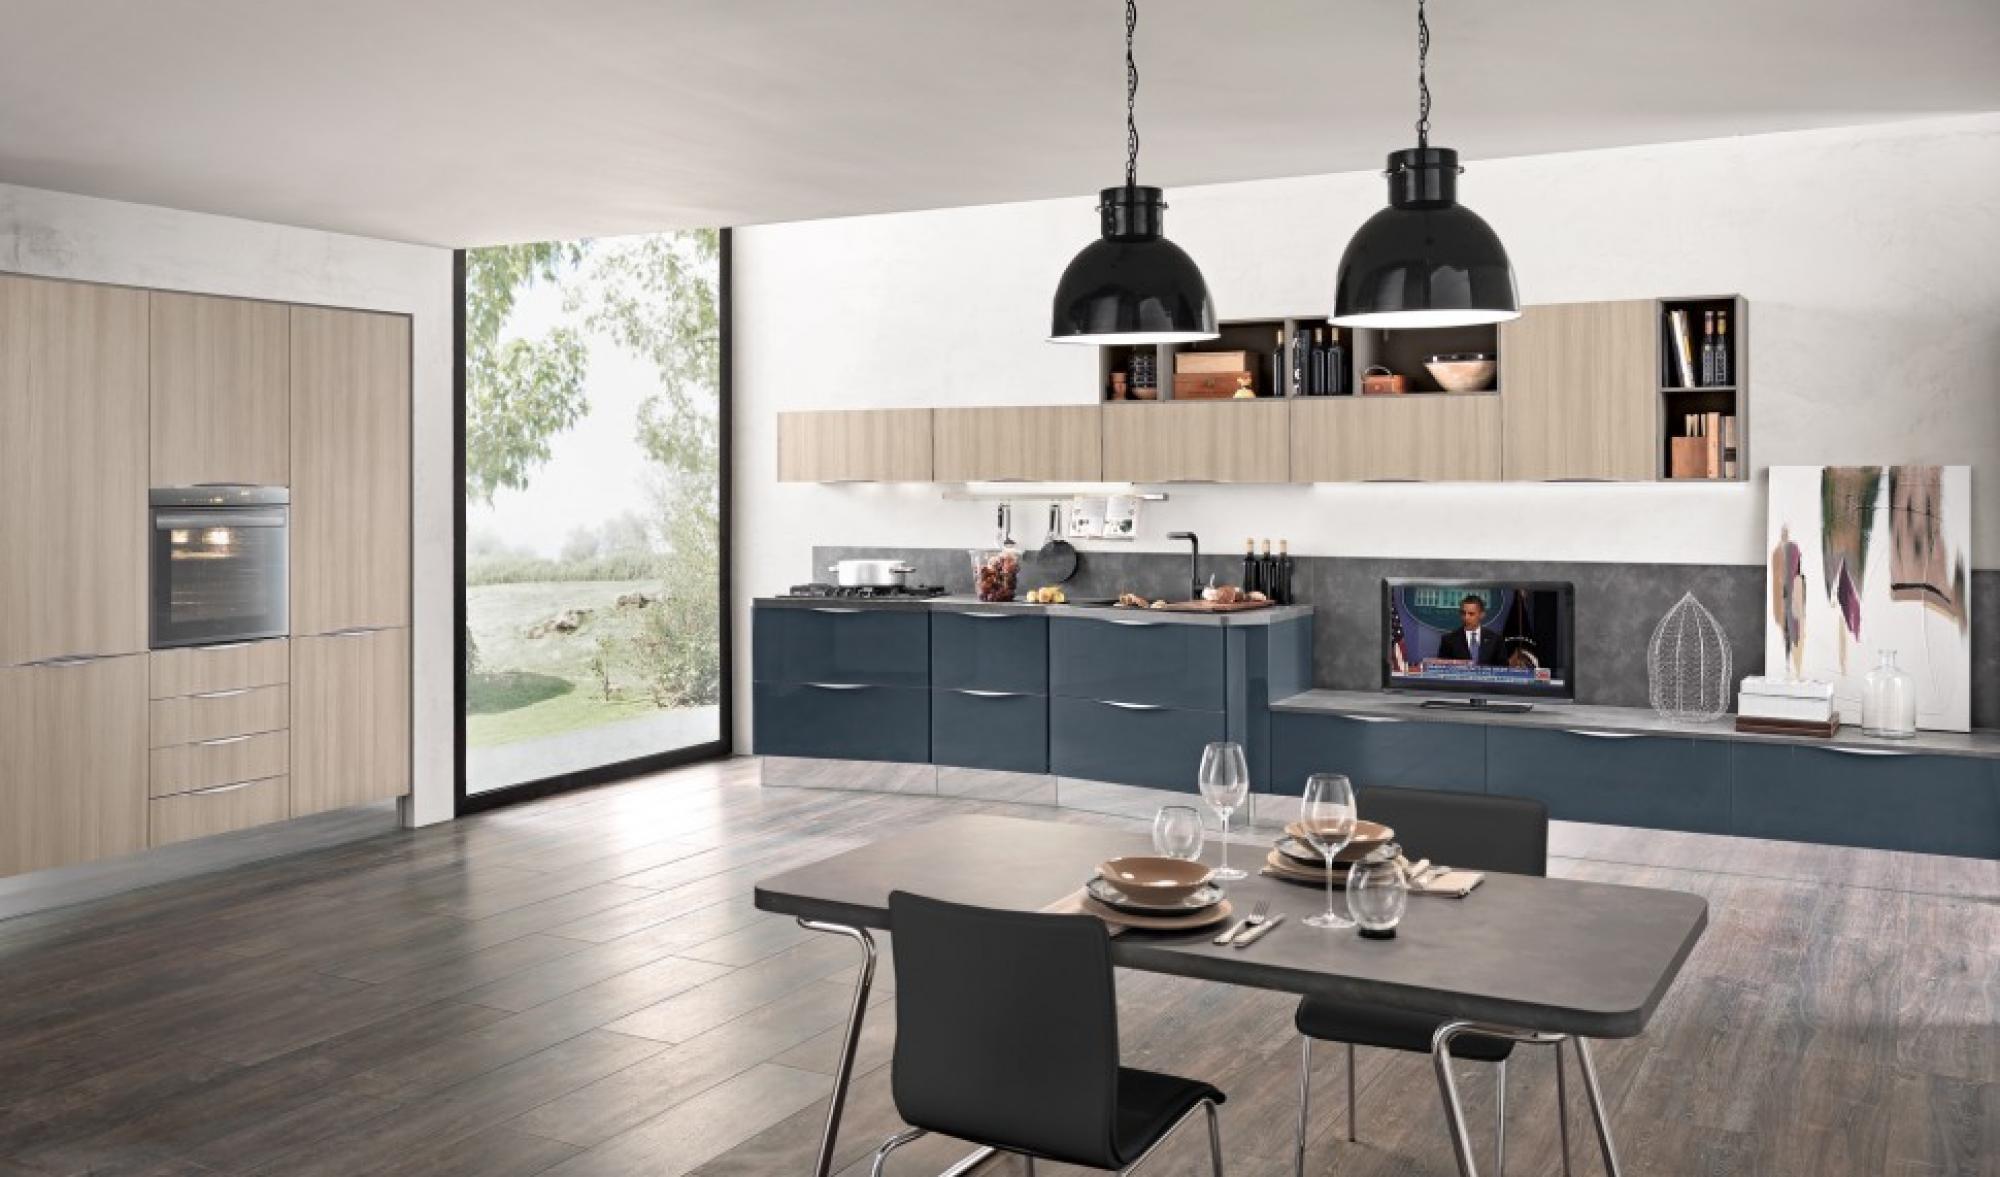 Cucina artec paragon scontato del 25 cucine a prezzi for Zoccolo casa moderna